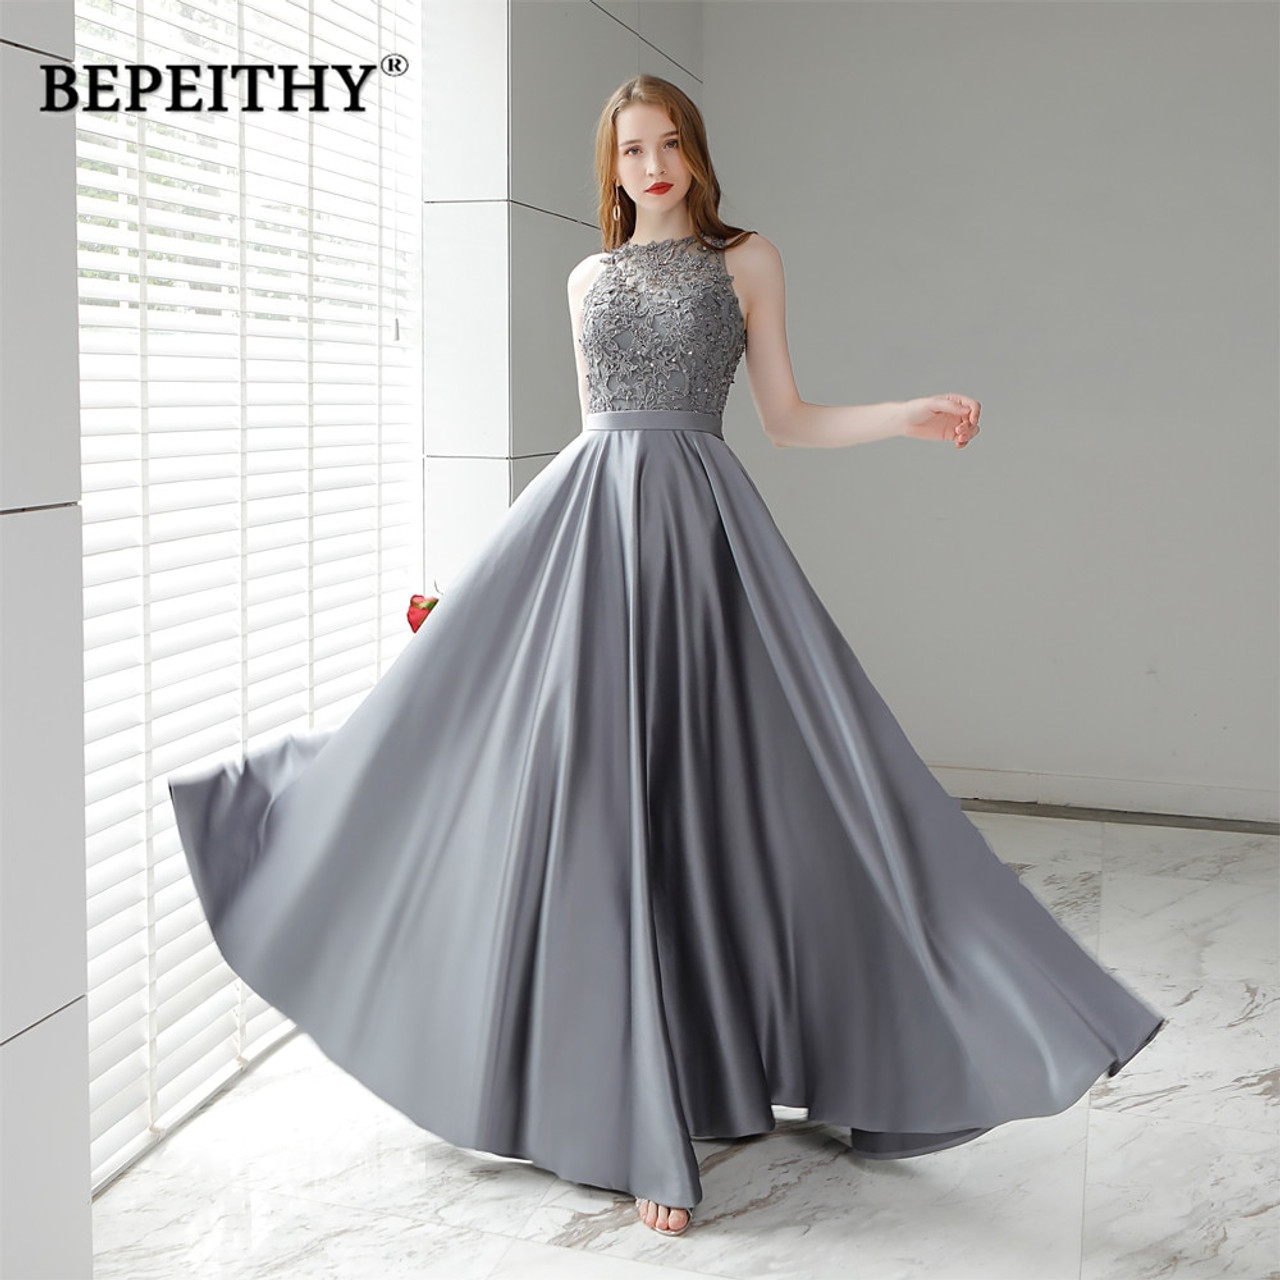 favorable price great prices coupon codes Vestido De Festa Gray Long Evening Dress 2018 O Neck Lace Top Vintage  Elegant Prom Party Dresses Abendkleider Hot Sale